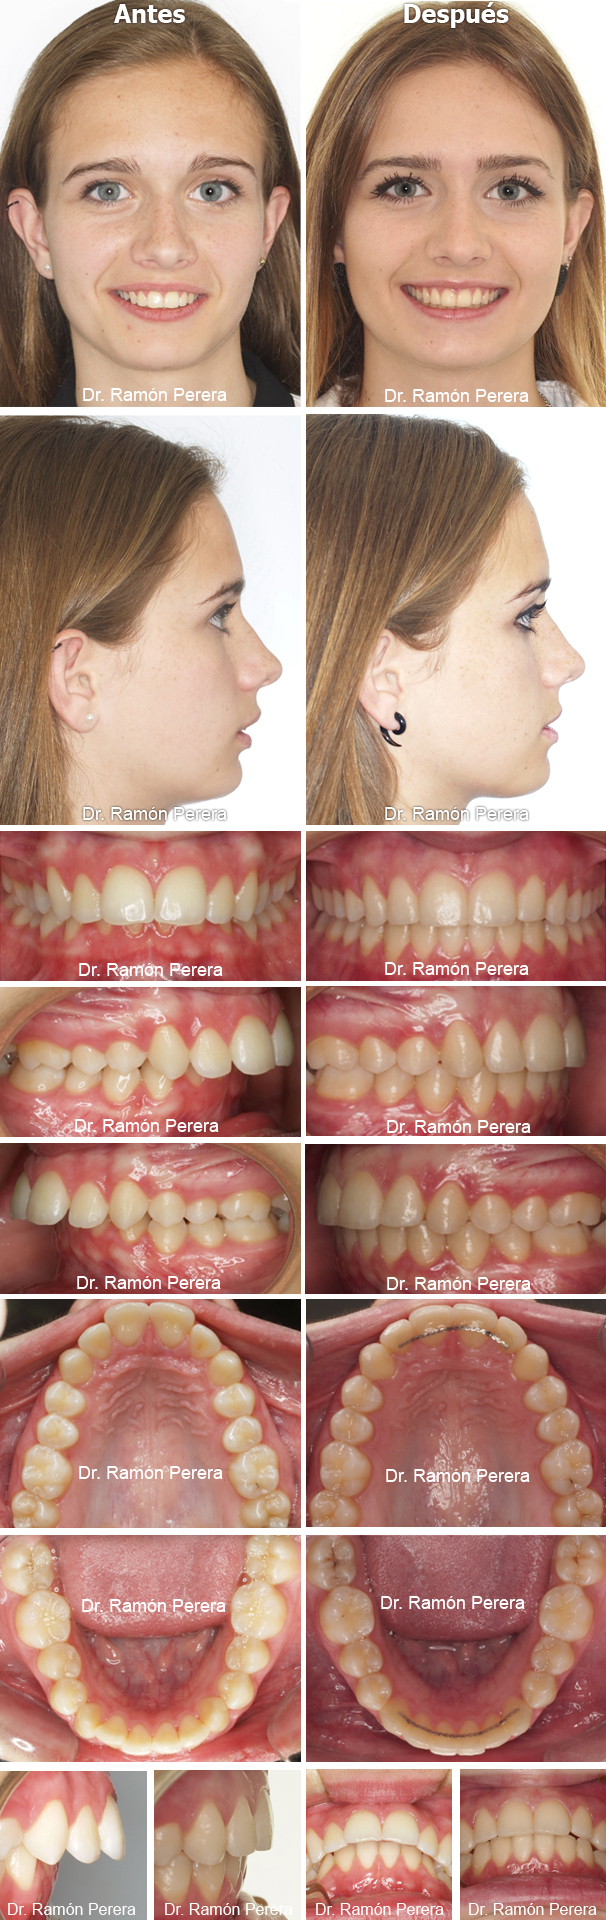 Clase II por déficit mandibular